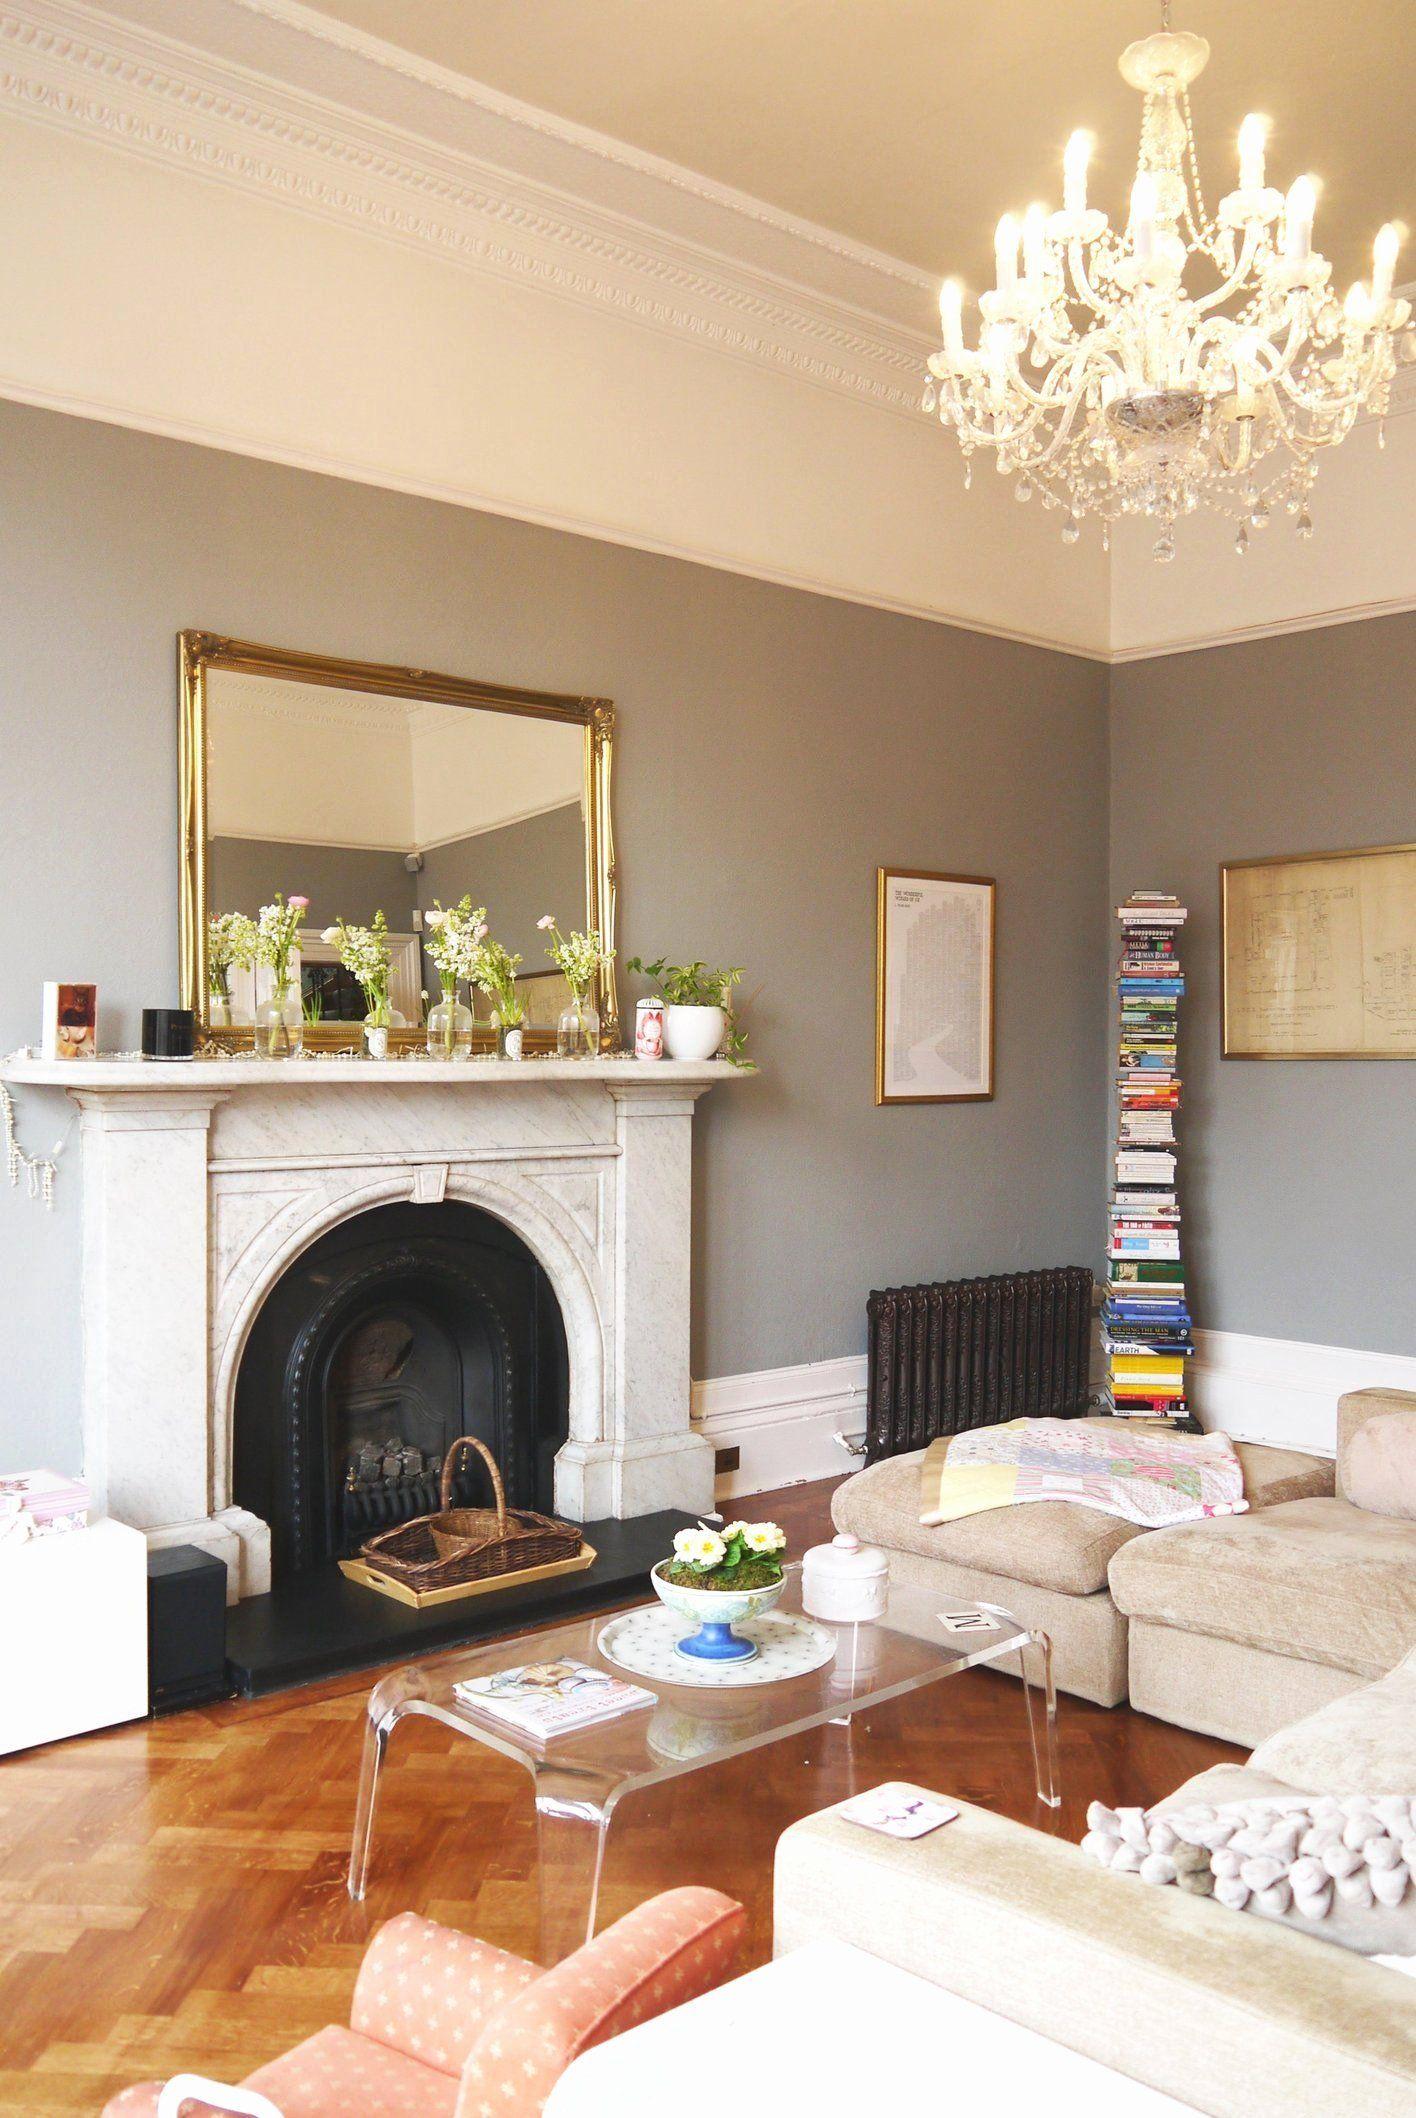 Beige Paint Living Room New Wohnzimmer Grau Beige Ruangan Ruang Tamu Neutral colored living room